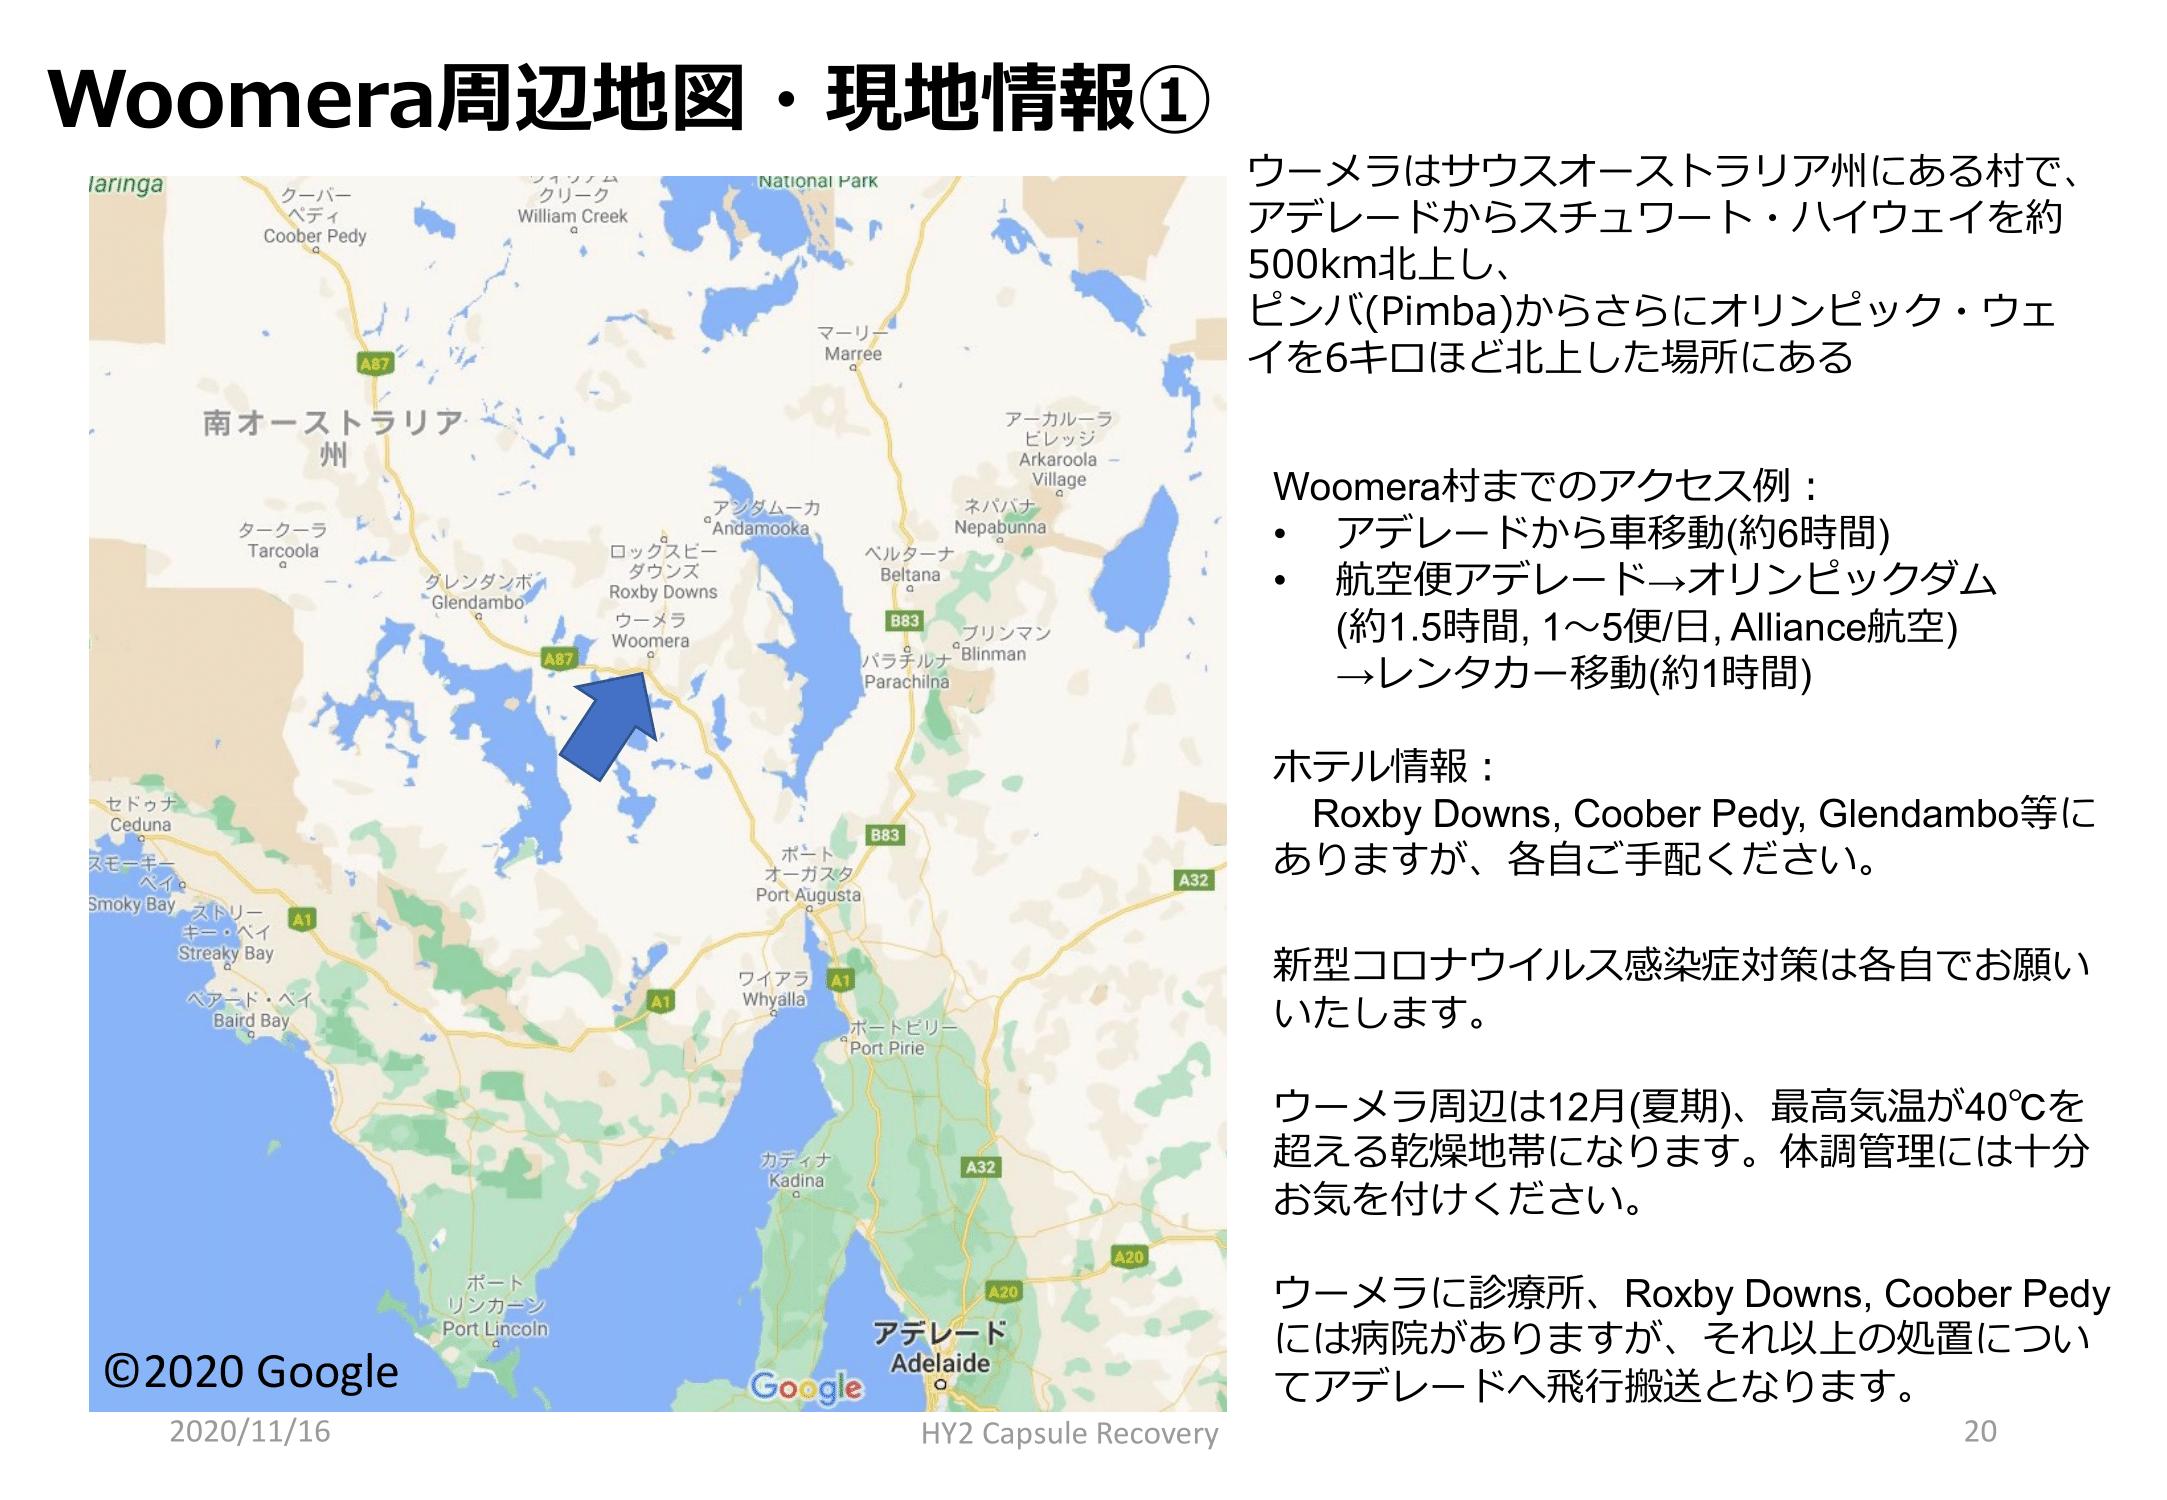 f:id:Imamura:20201117222416p:plain